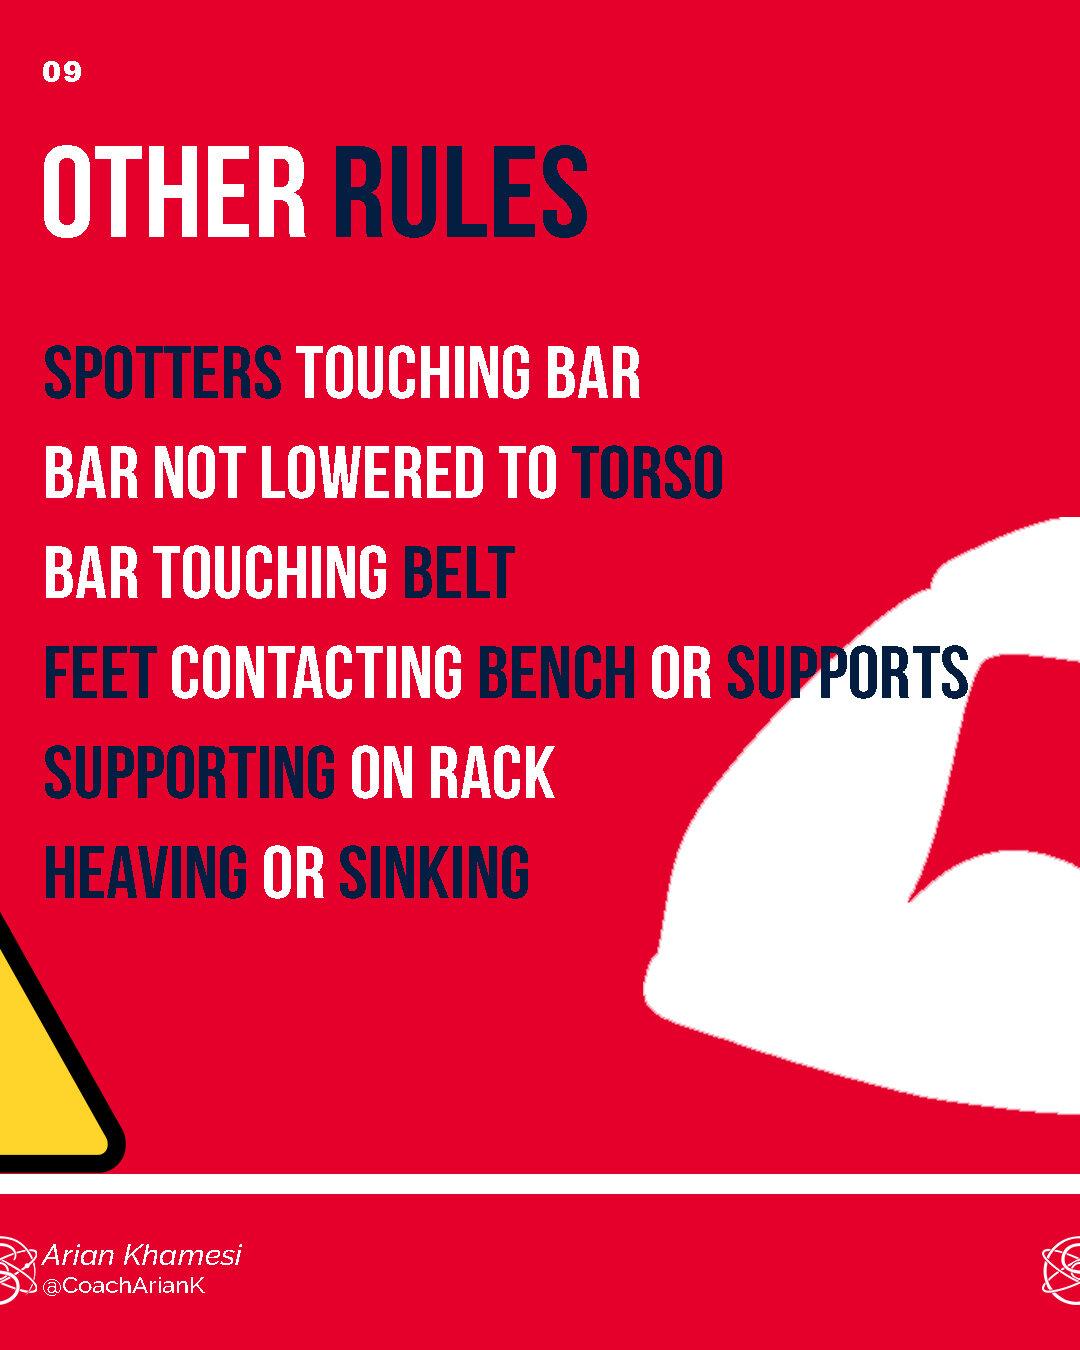 Bench-Rules_09.jpg